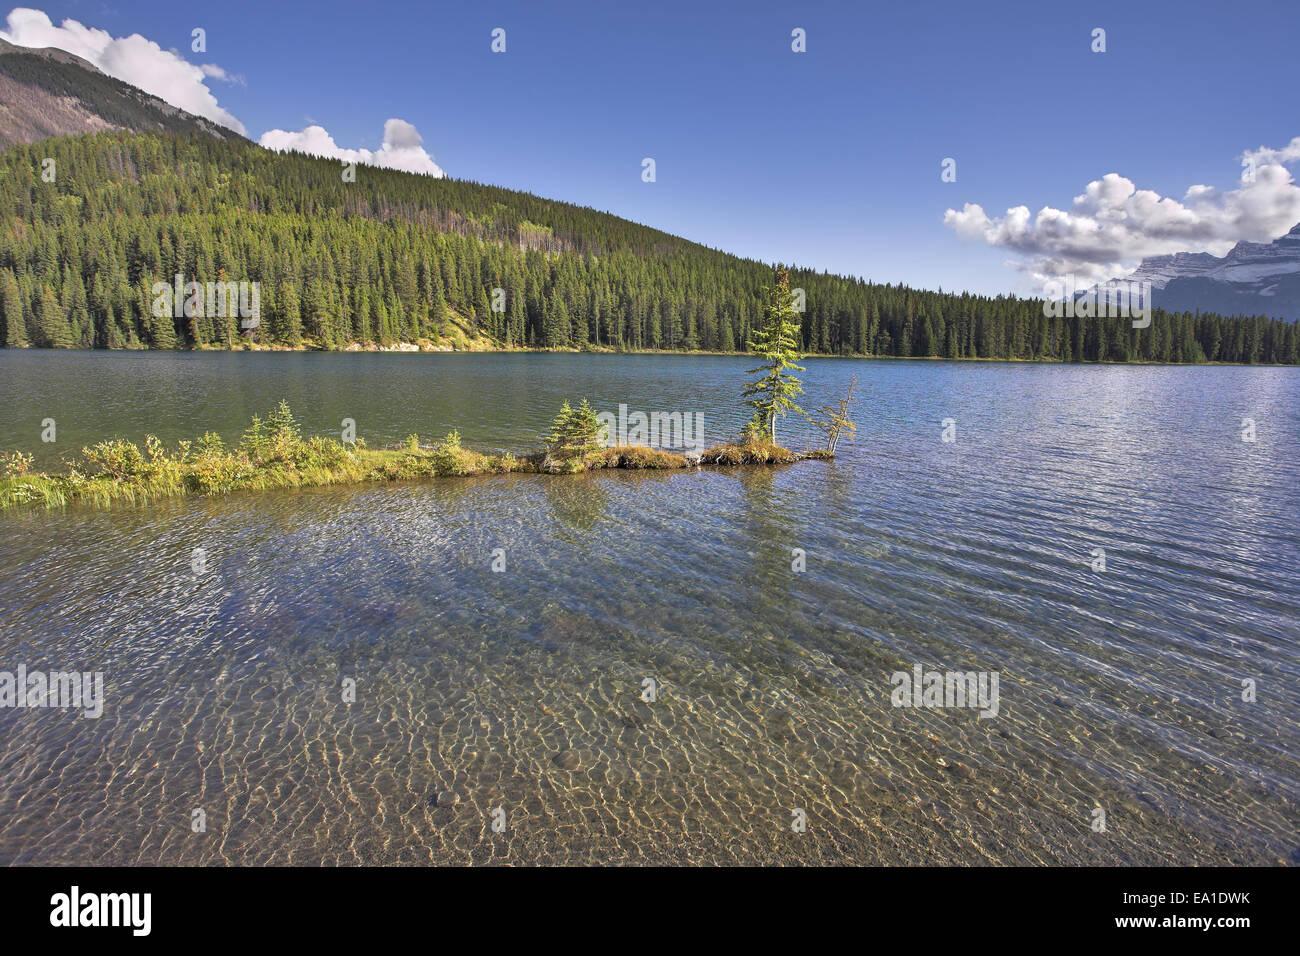 Tourist paradise. - Stock Image